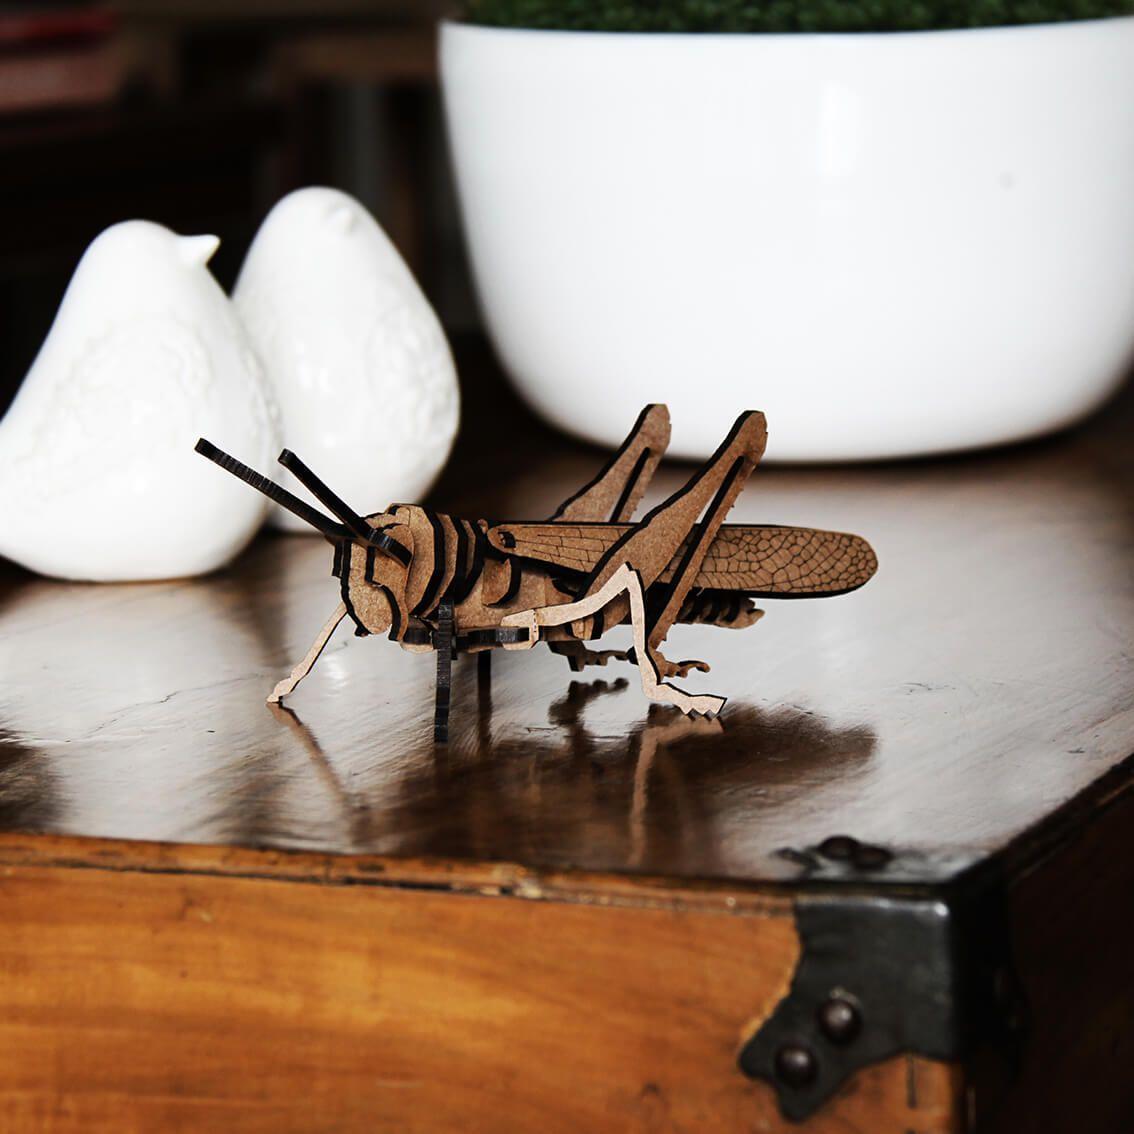 Insetos - Miniatura para montar Gafanhoto